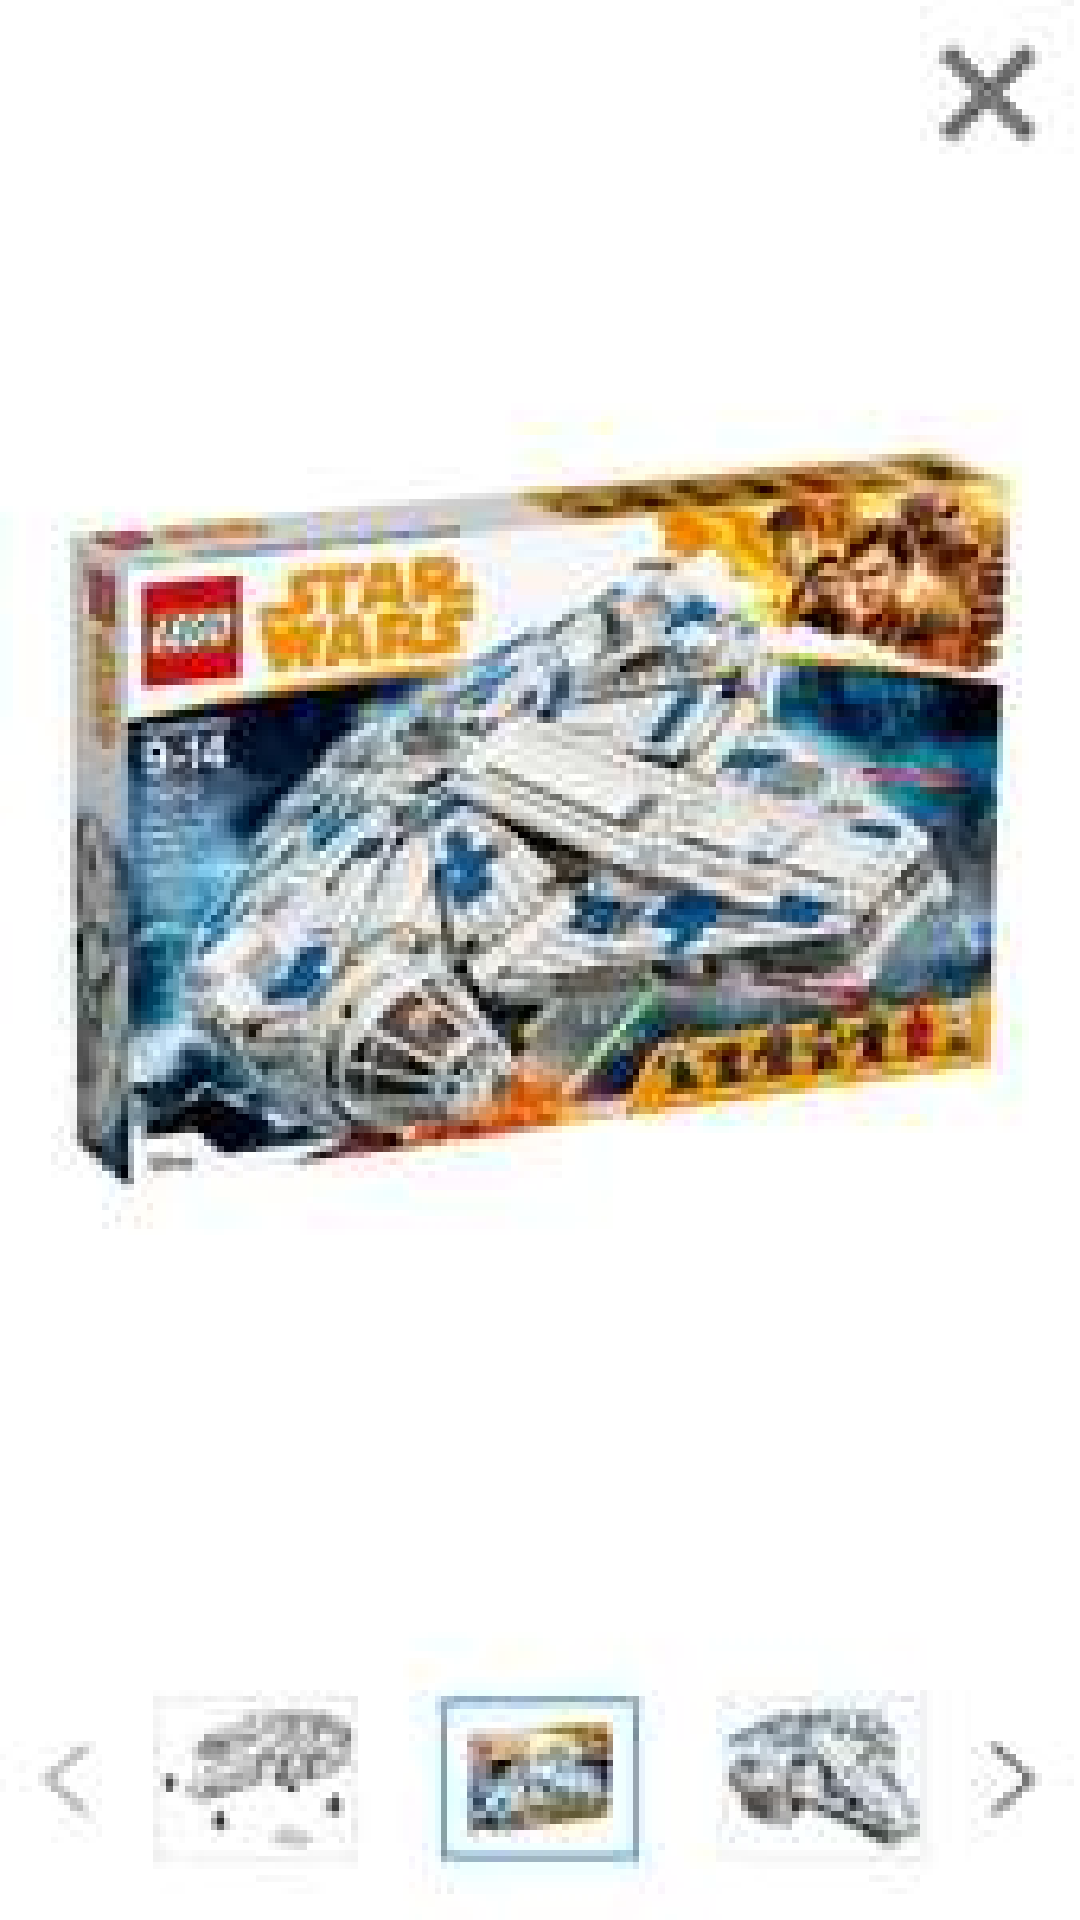 LEGO STAR WARS 75212 Kessel Run Millenium Falcon